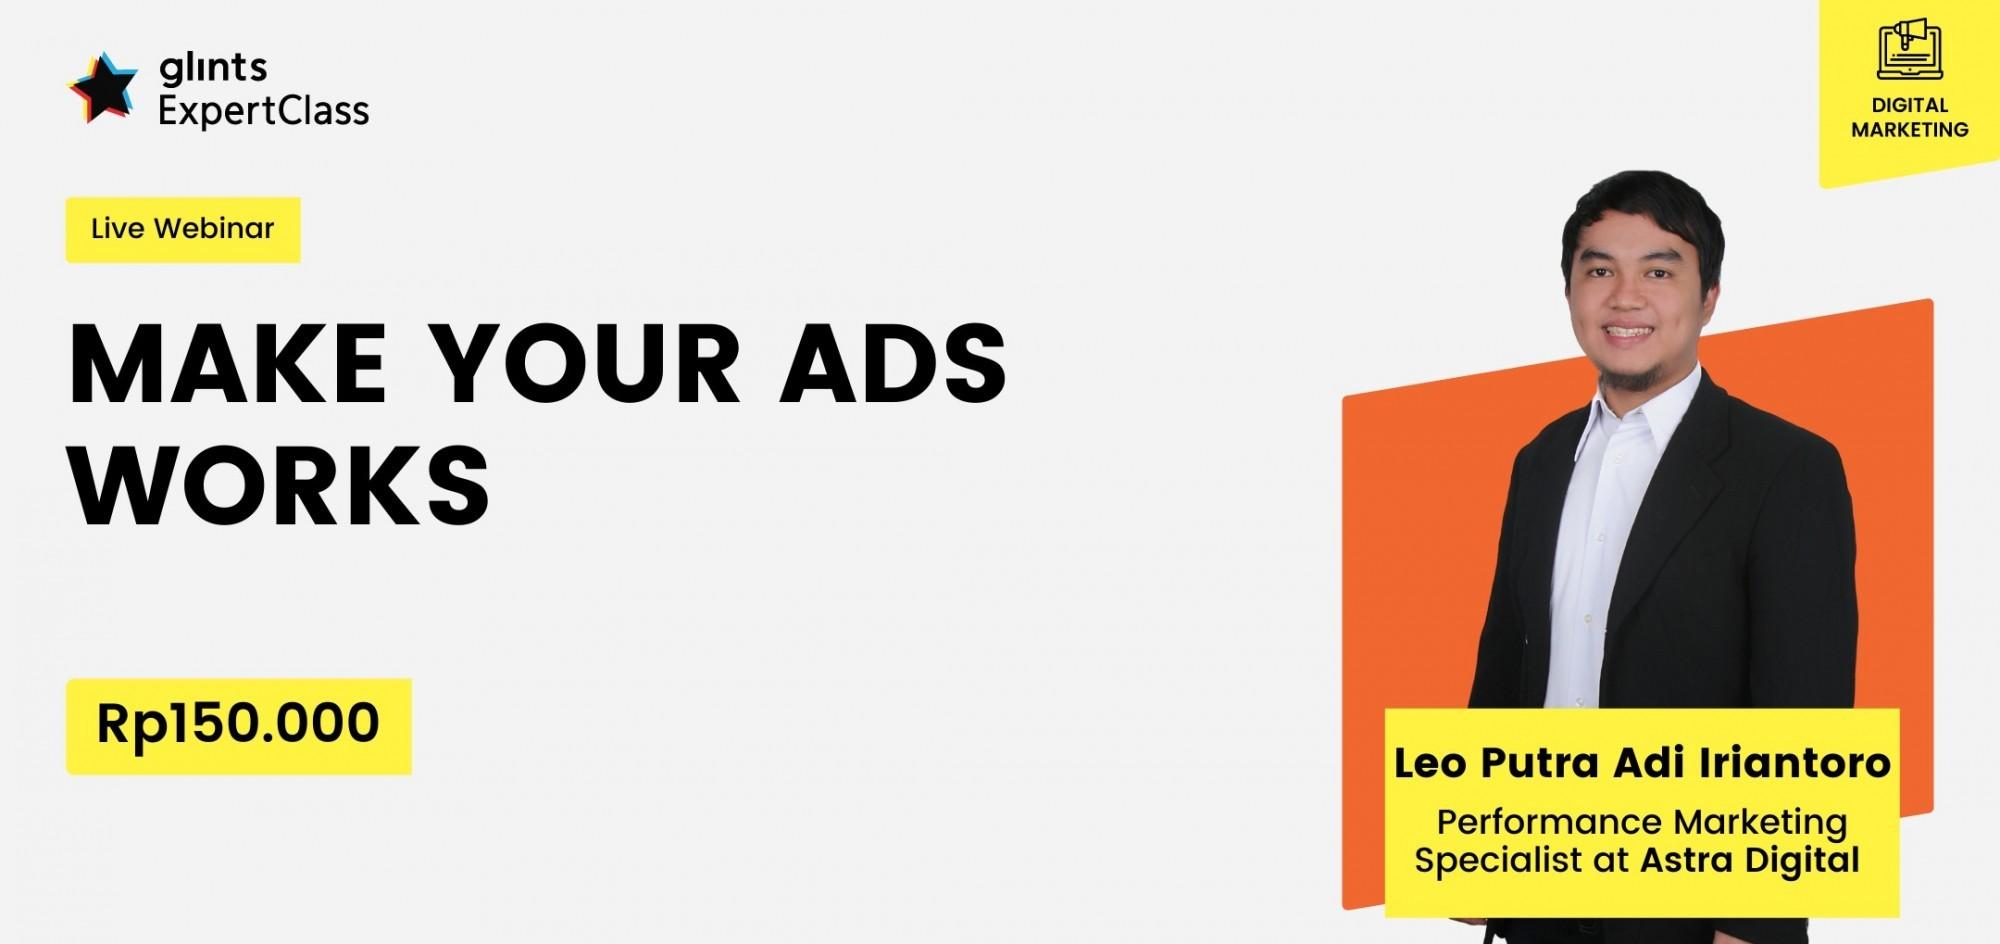 [Online Glints ExpertClass] Make Your Ads Works